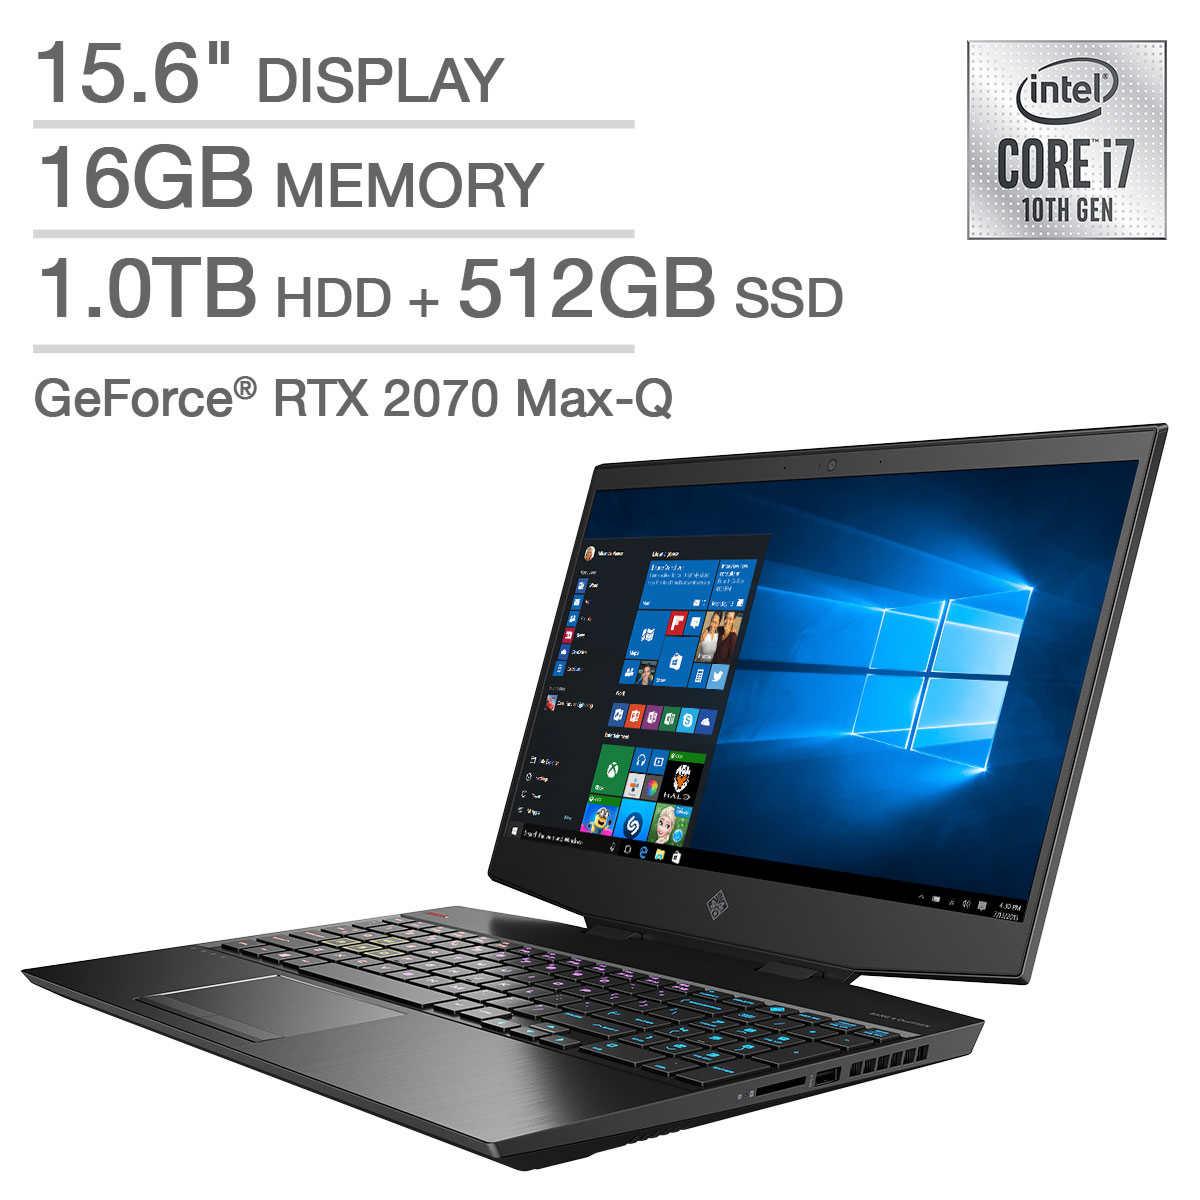 Costco HP OMEN 15.6 Laptop - 10th Gen Intel Core i7-10750H - GeForce RTX 2070 Max Q - IPS 144Hz 1080p $1449.99